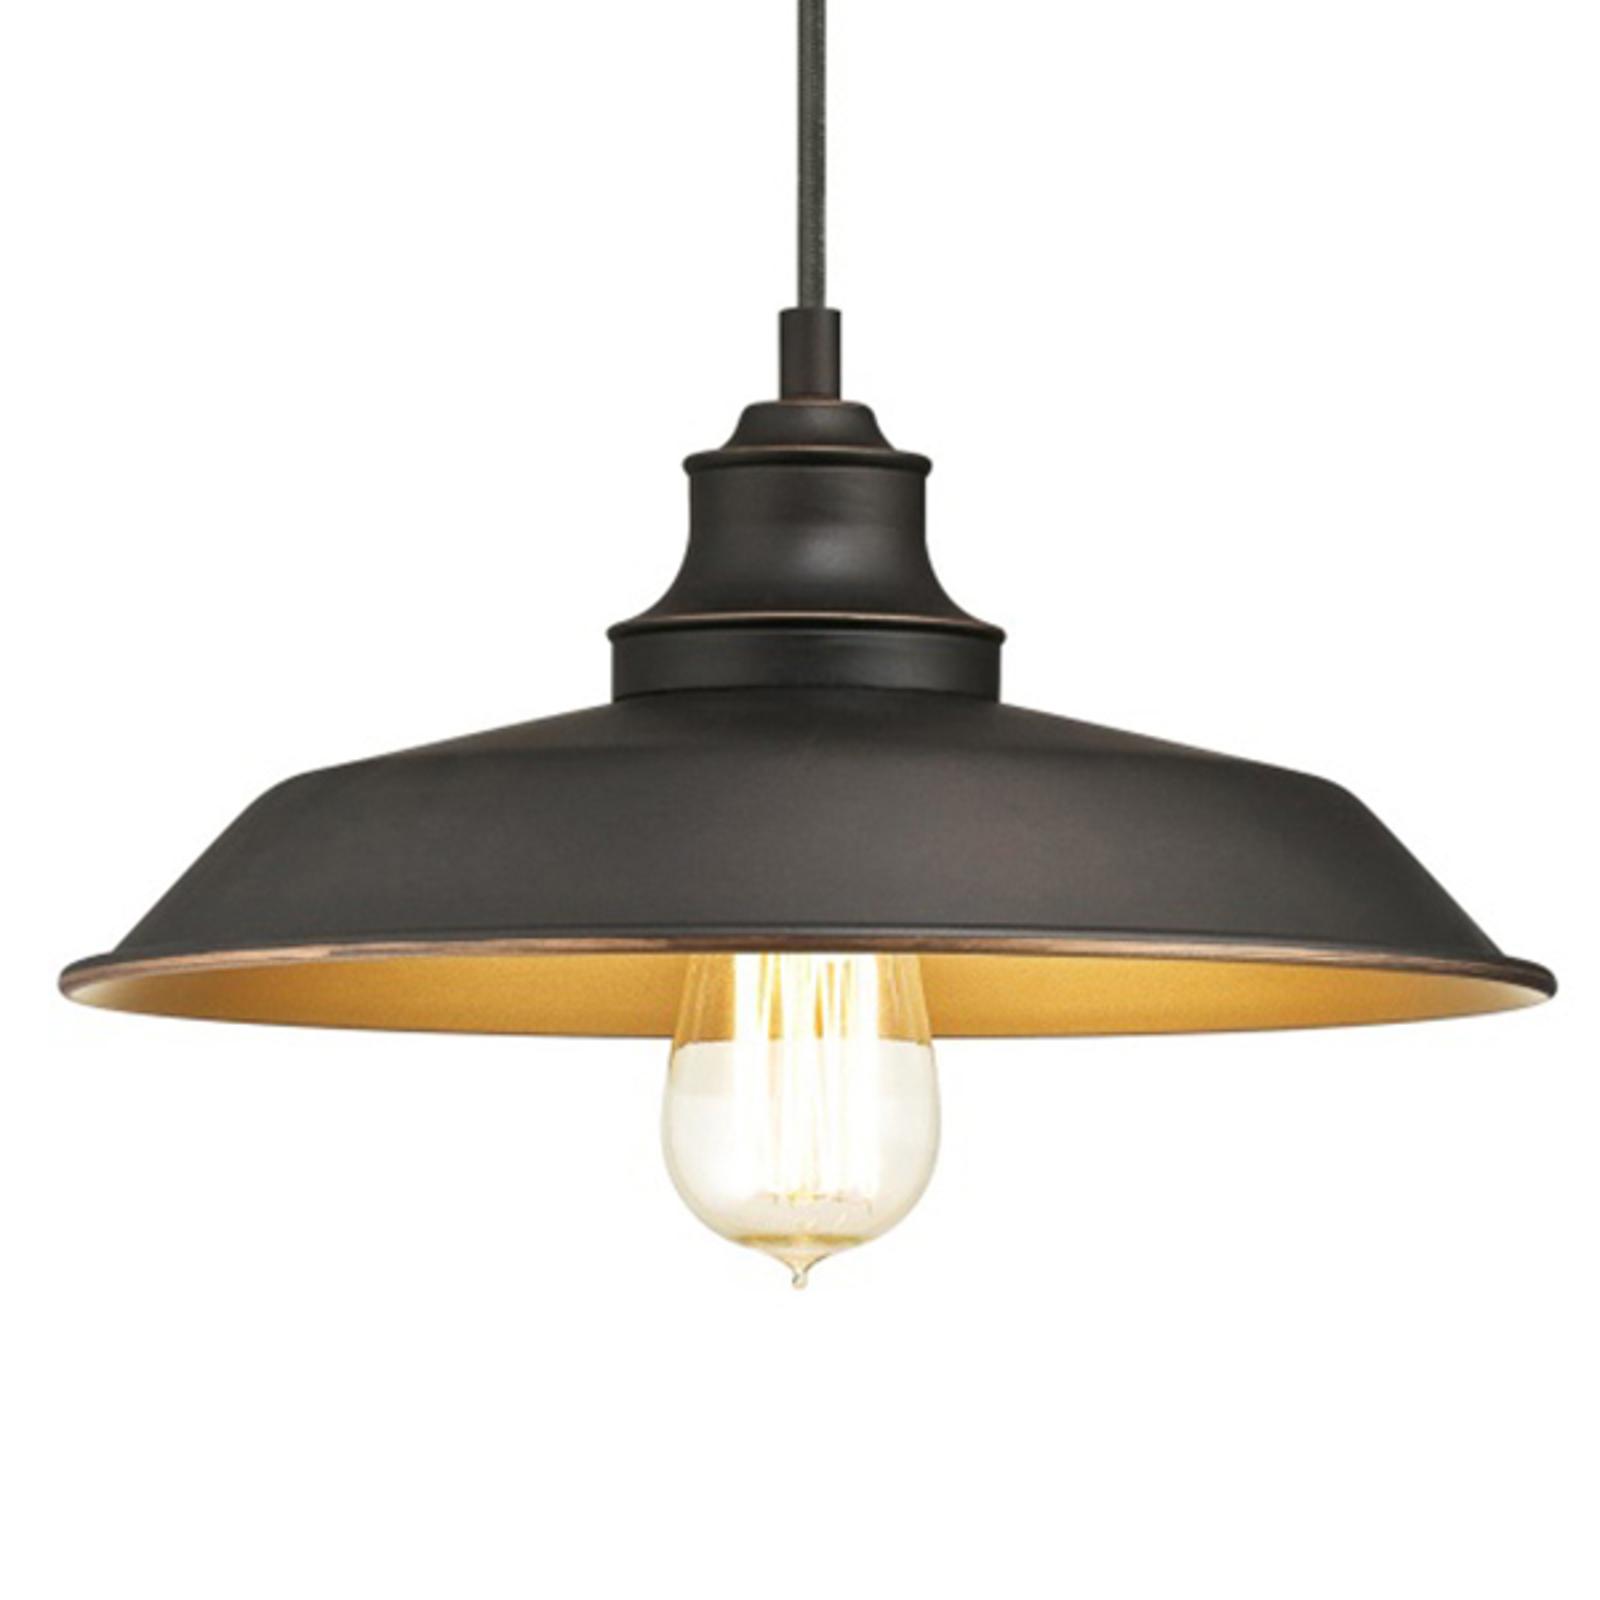 Westinghouse hengelampe Iron Hill, svart, 1 lys